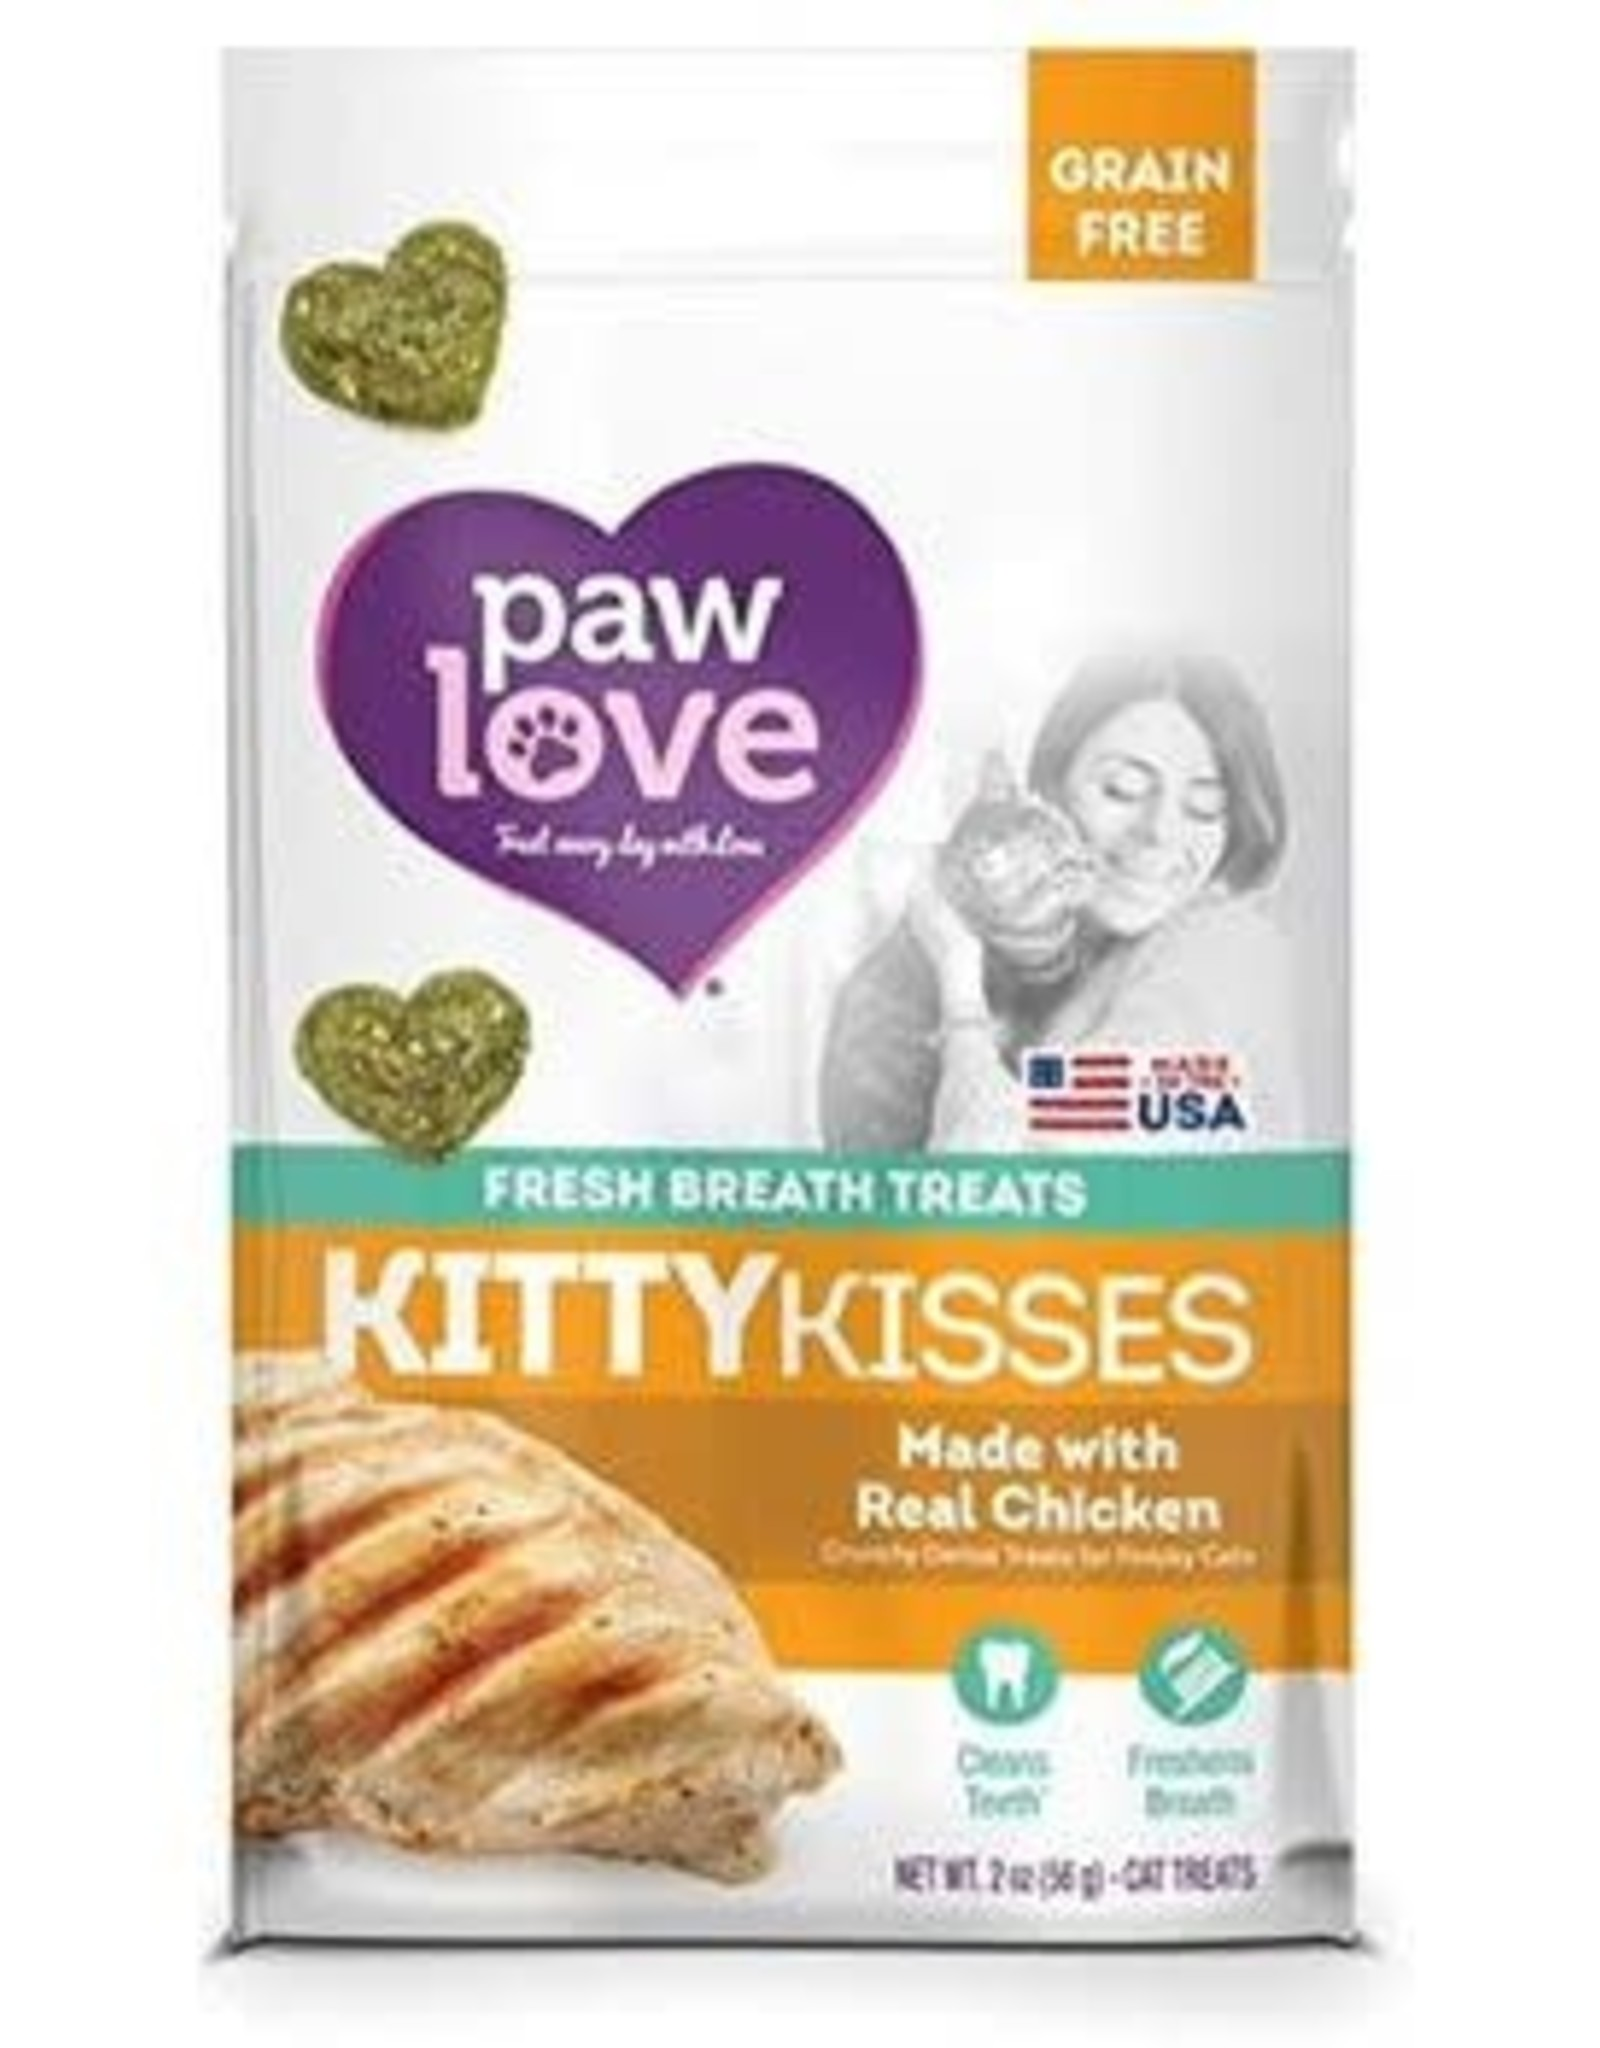 Barkworthies BARKWORTHIES CAT KITTY KISS GRAIN FREE CHICKEN 2OZ